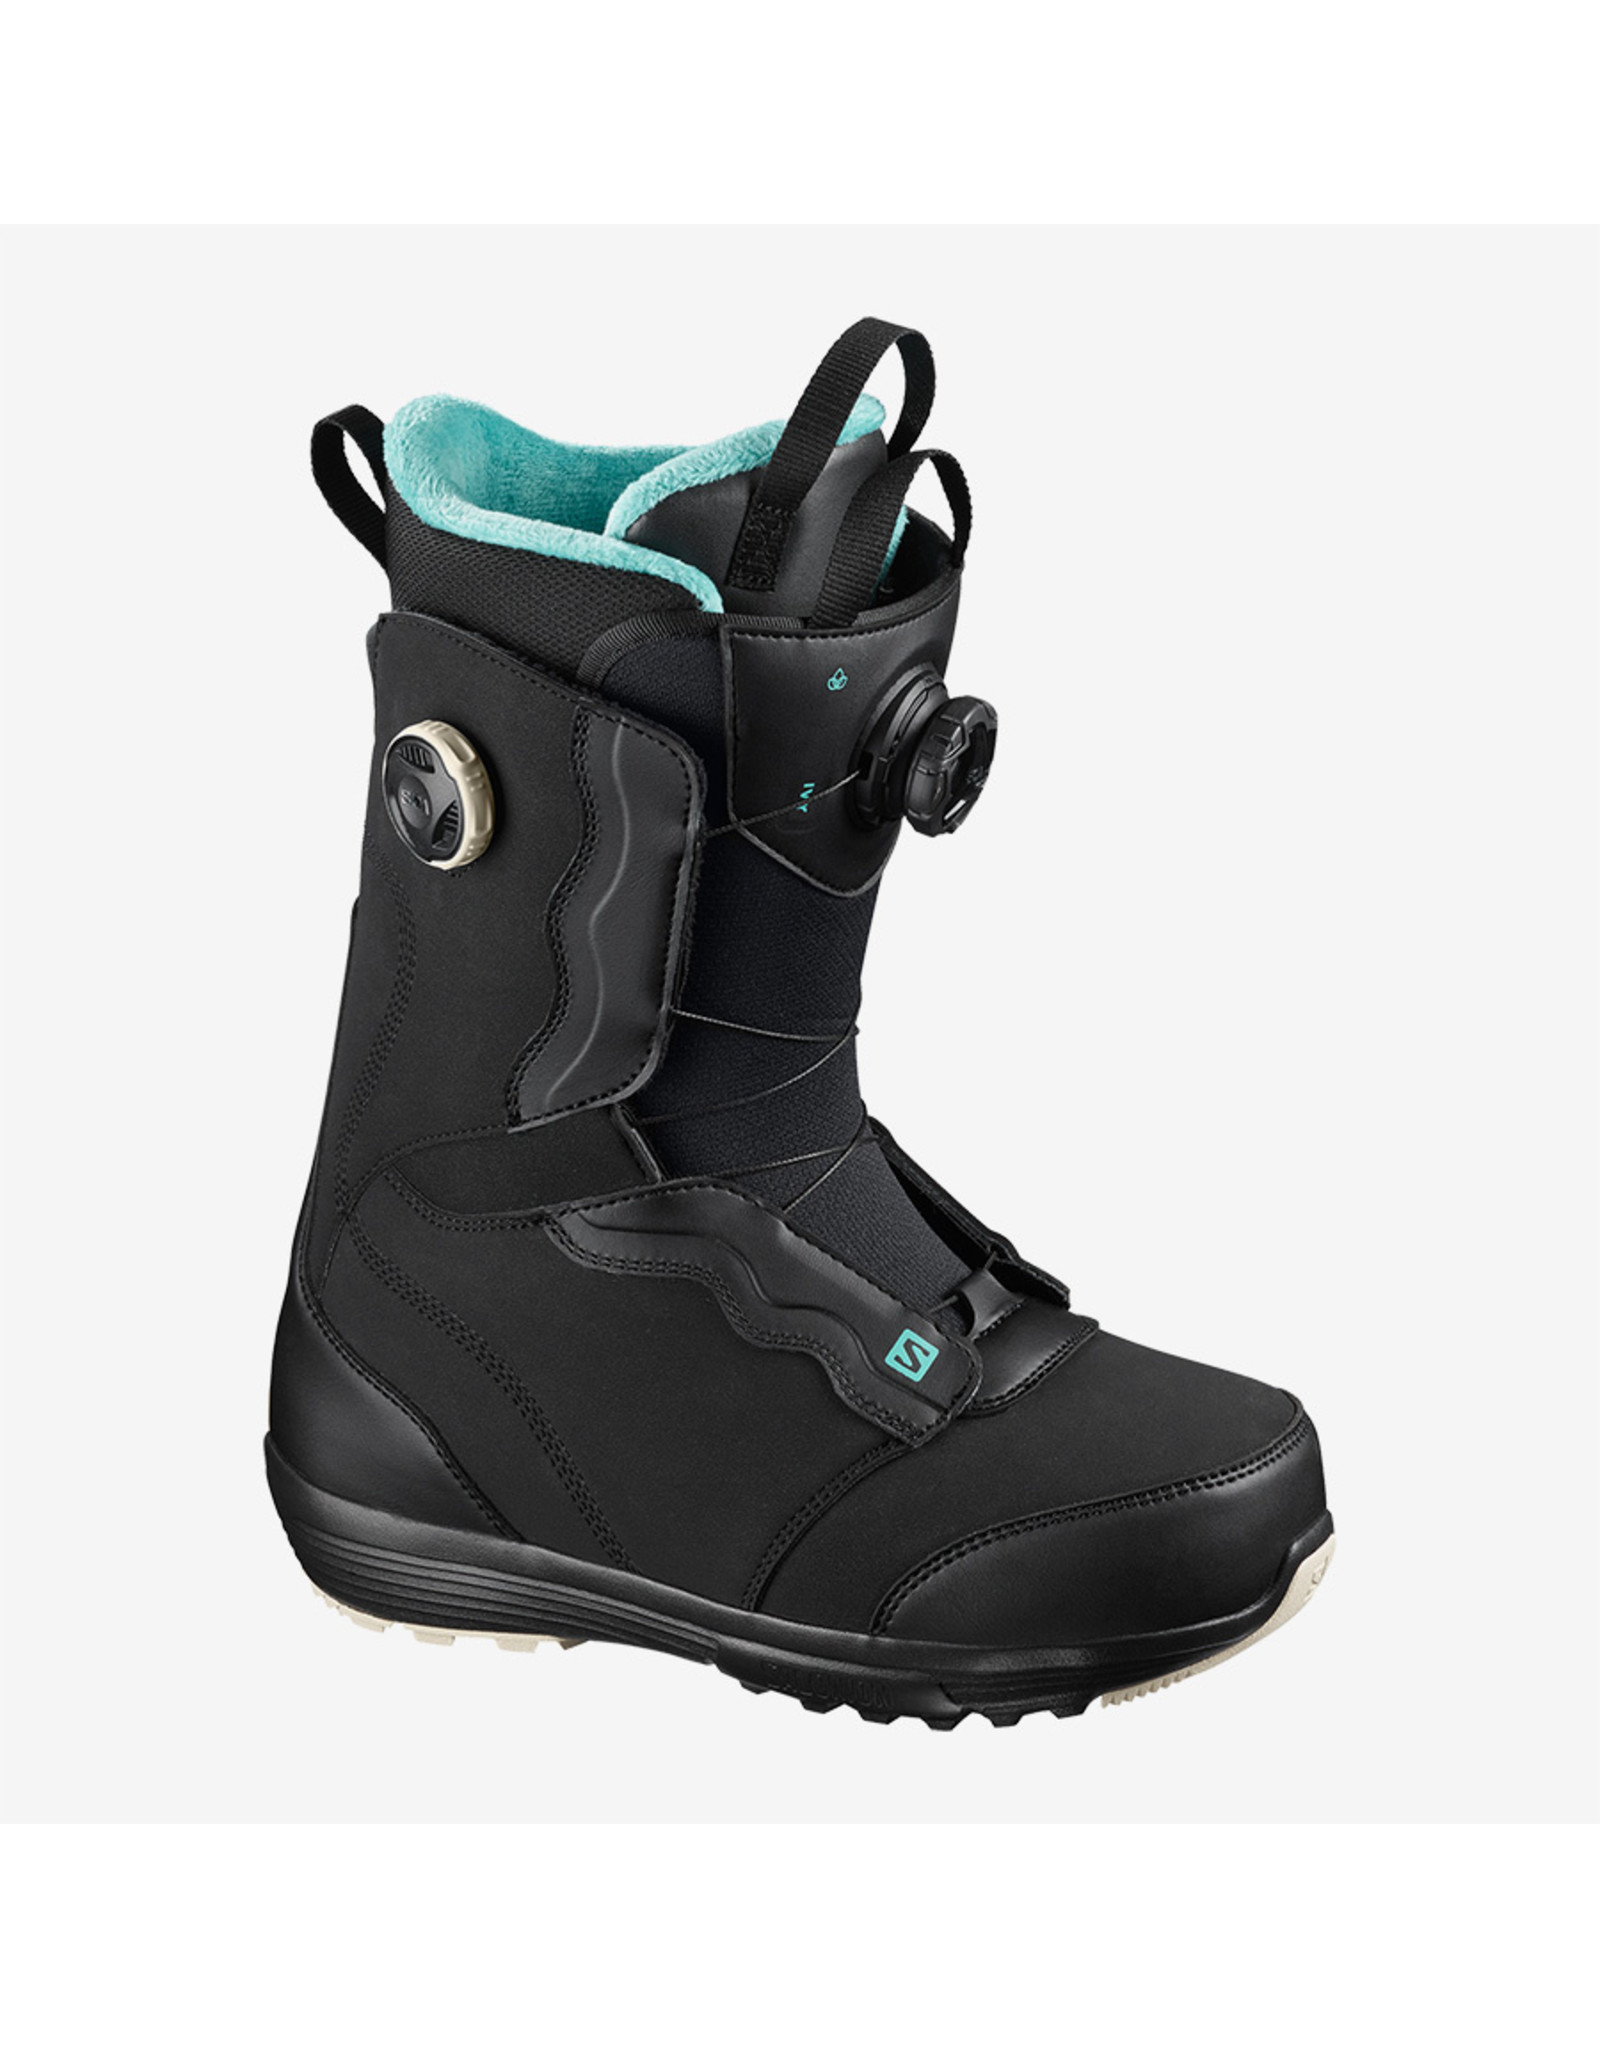 Salomon Salomon Women's Ivy SJ BOA Snowboard Boot